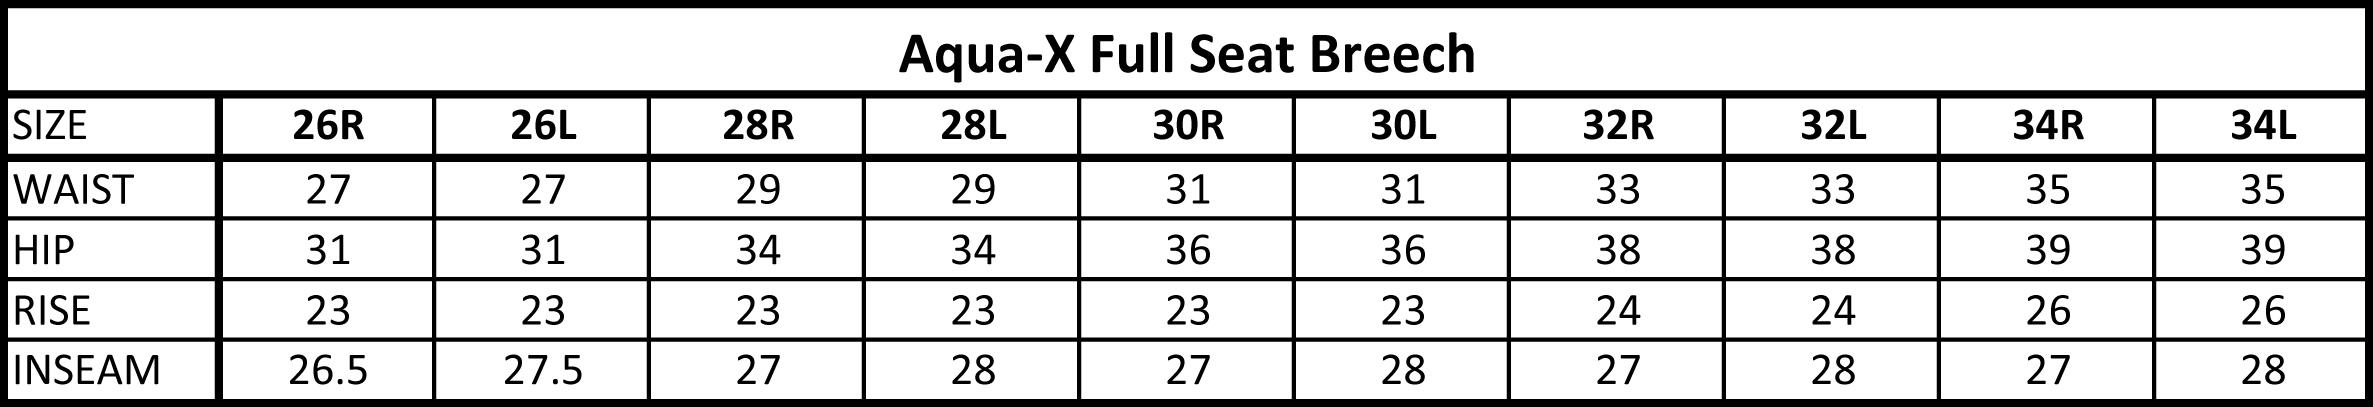 Ovation Aqua-X Full Seat Breeches Size Chart